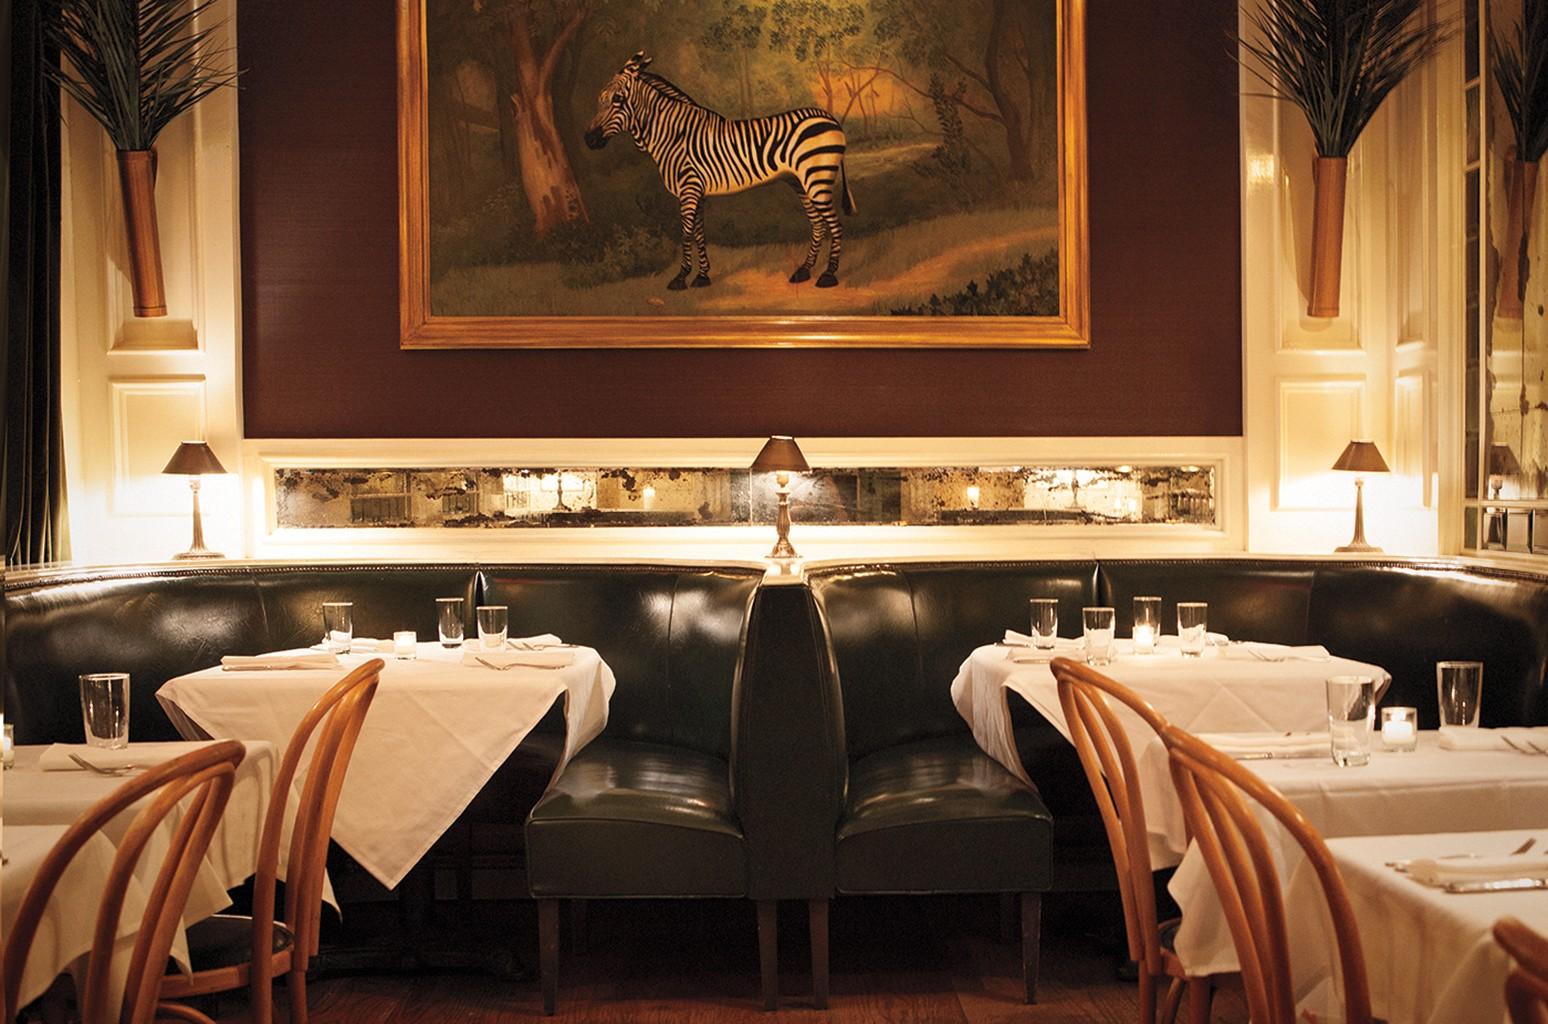 The Beatrice Inn in New York.